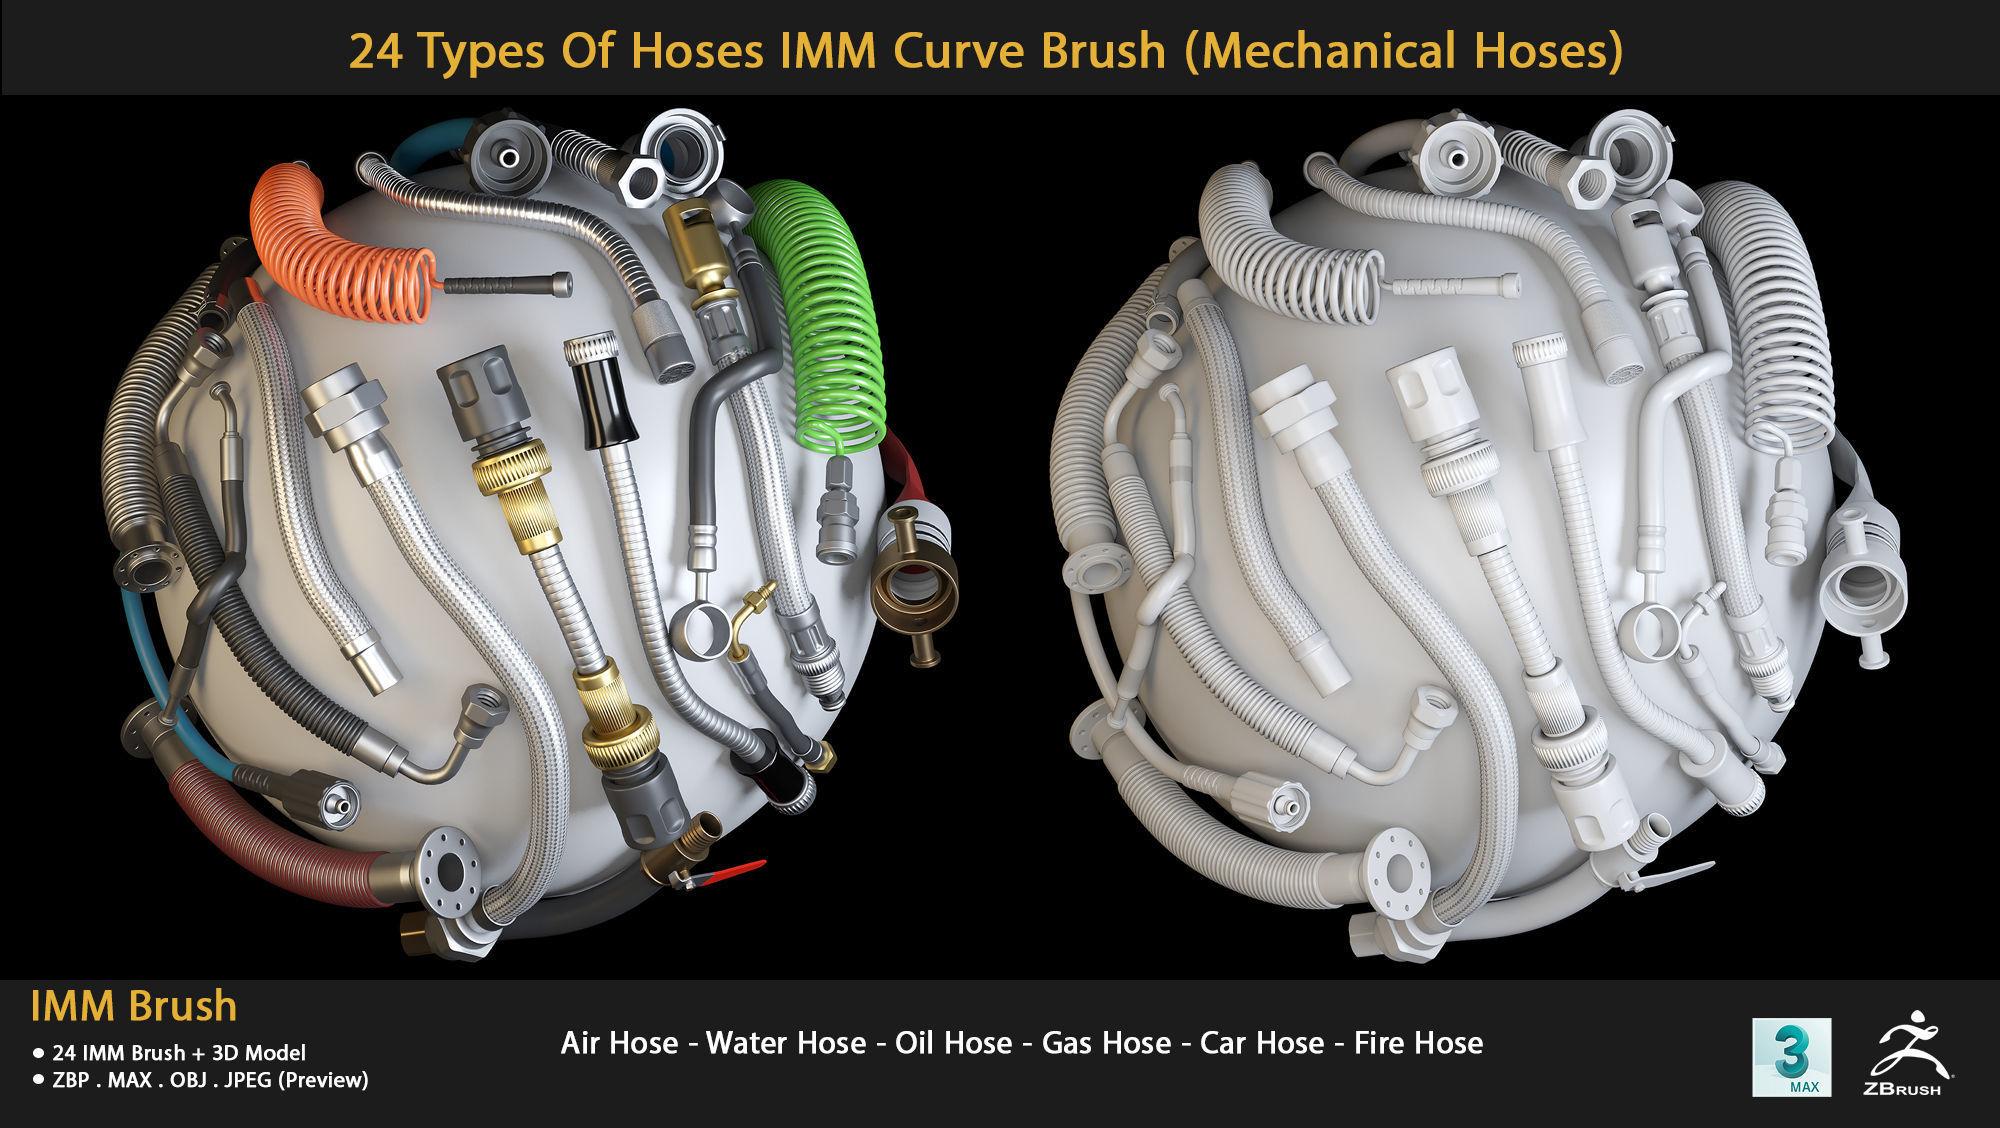 24 Types Of Hoses IMM Curve Brush- Mechanical Hoses